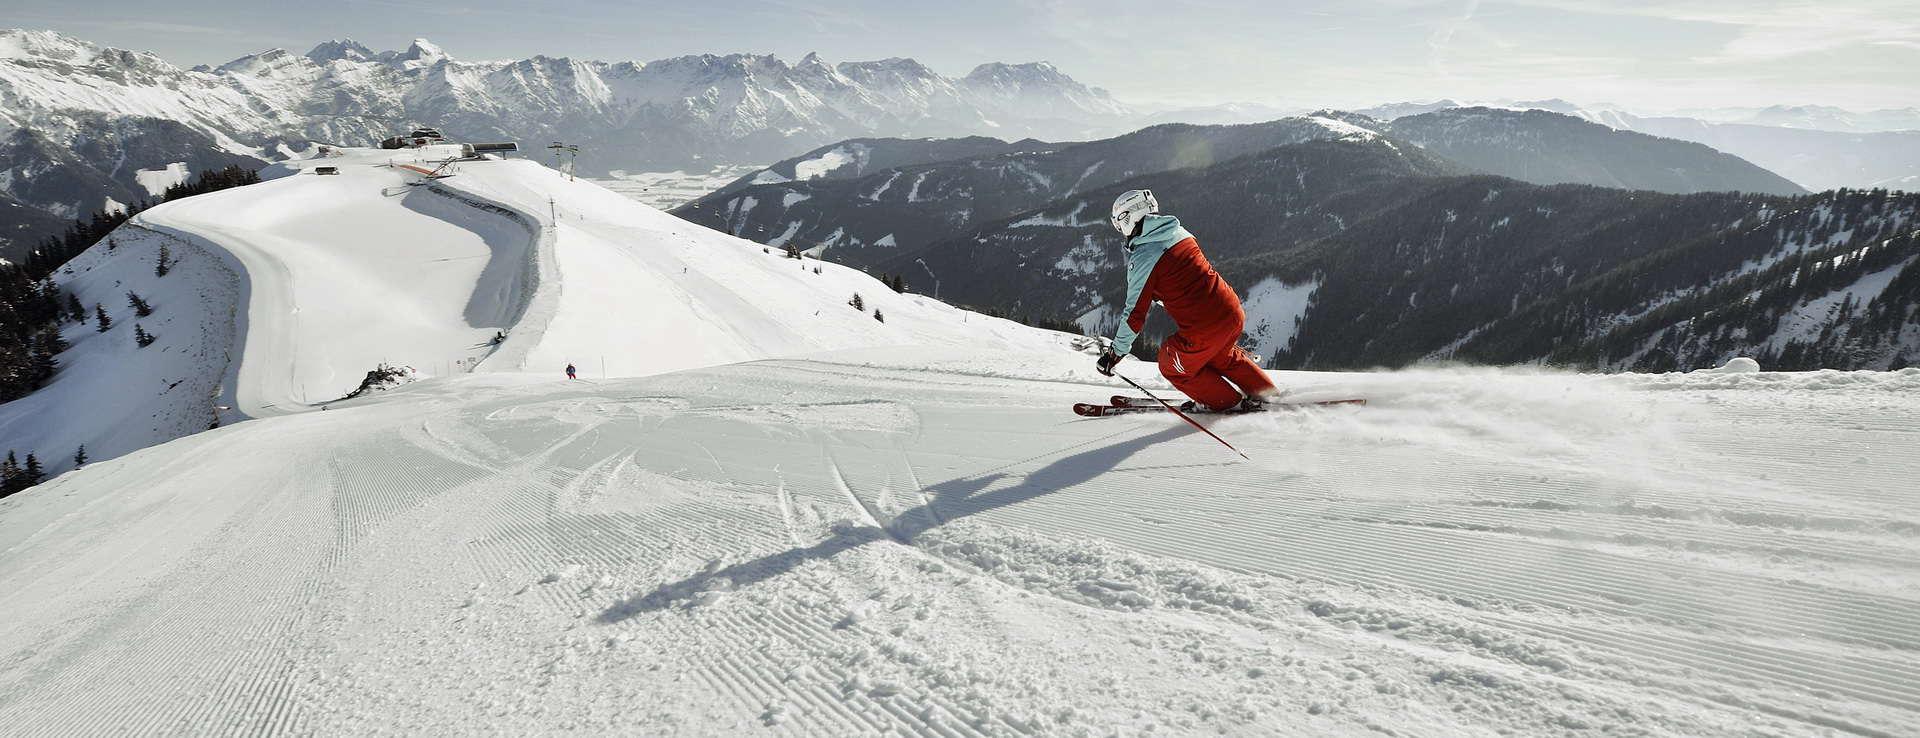 Skidresa - skidsemester till Österrike - Asitz Leogang